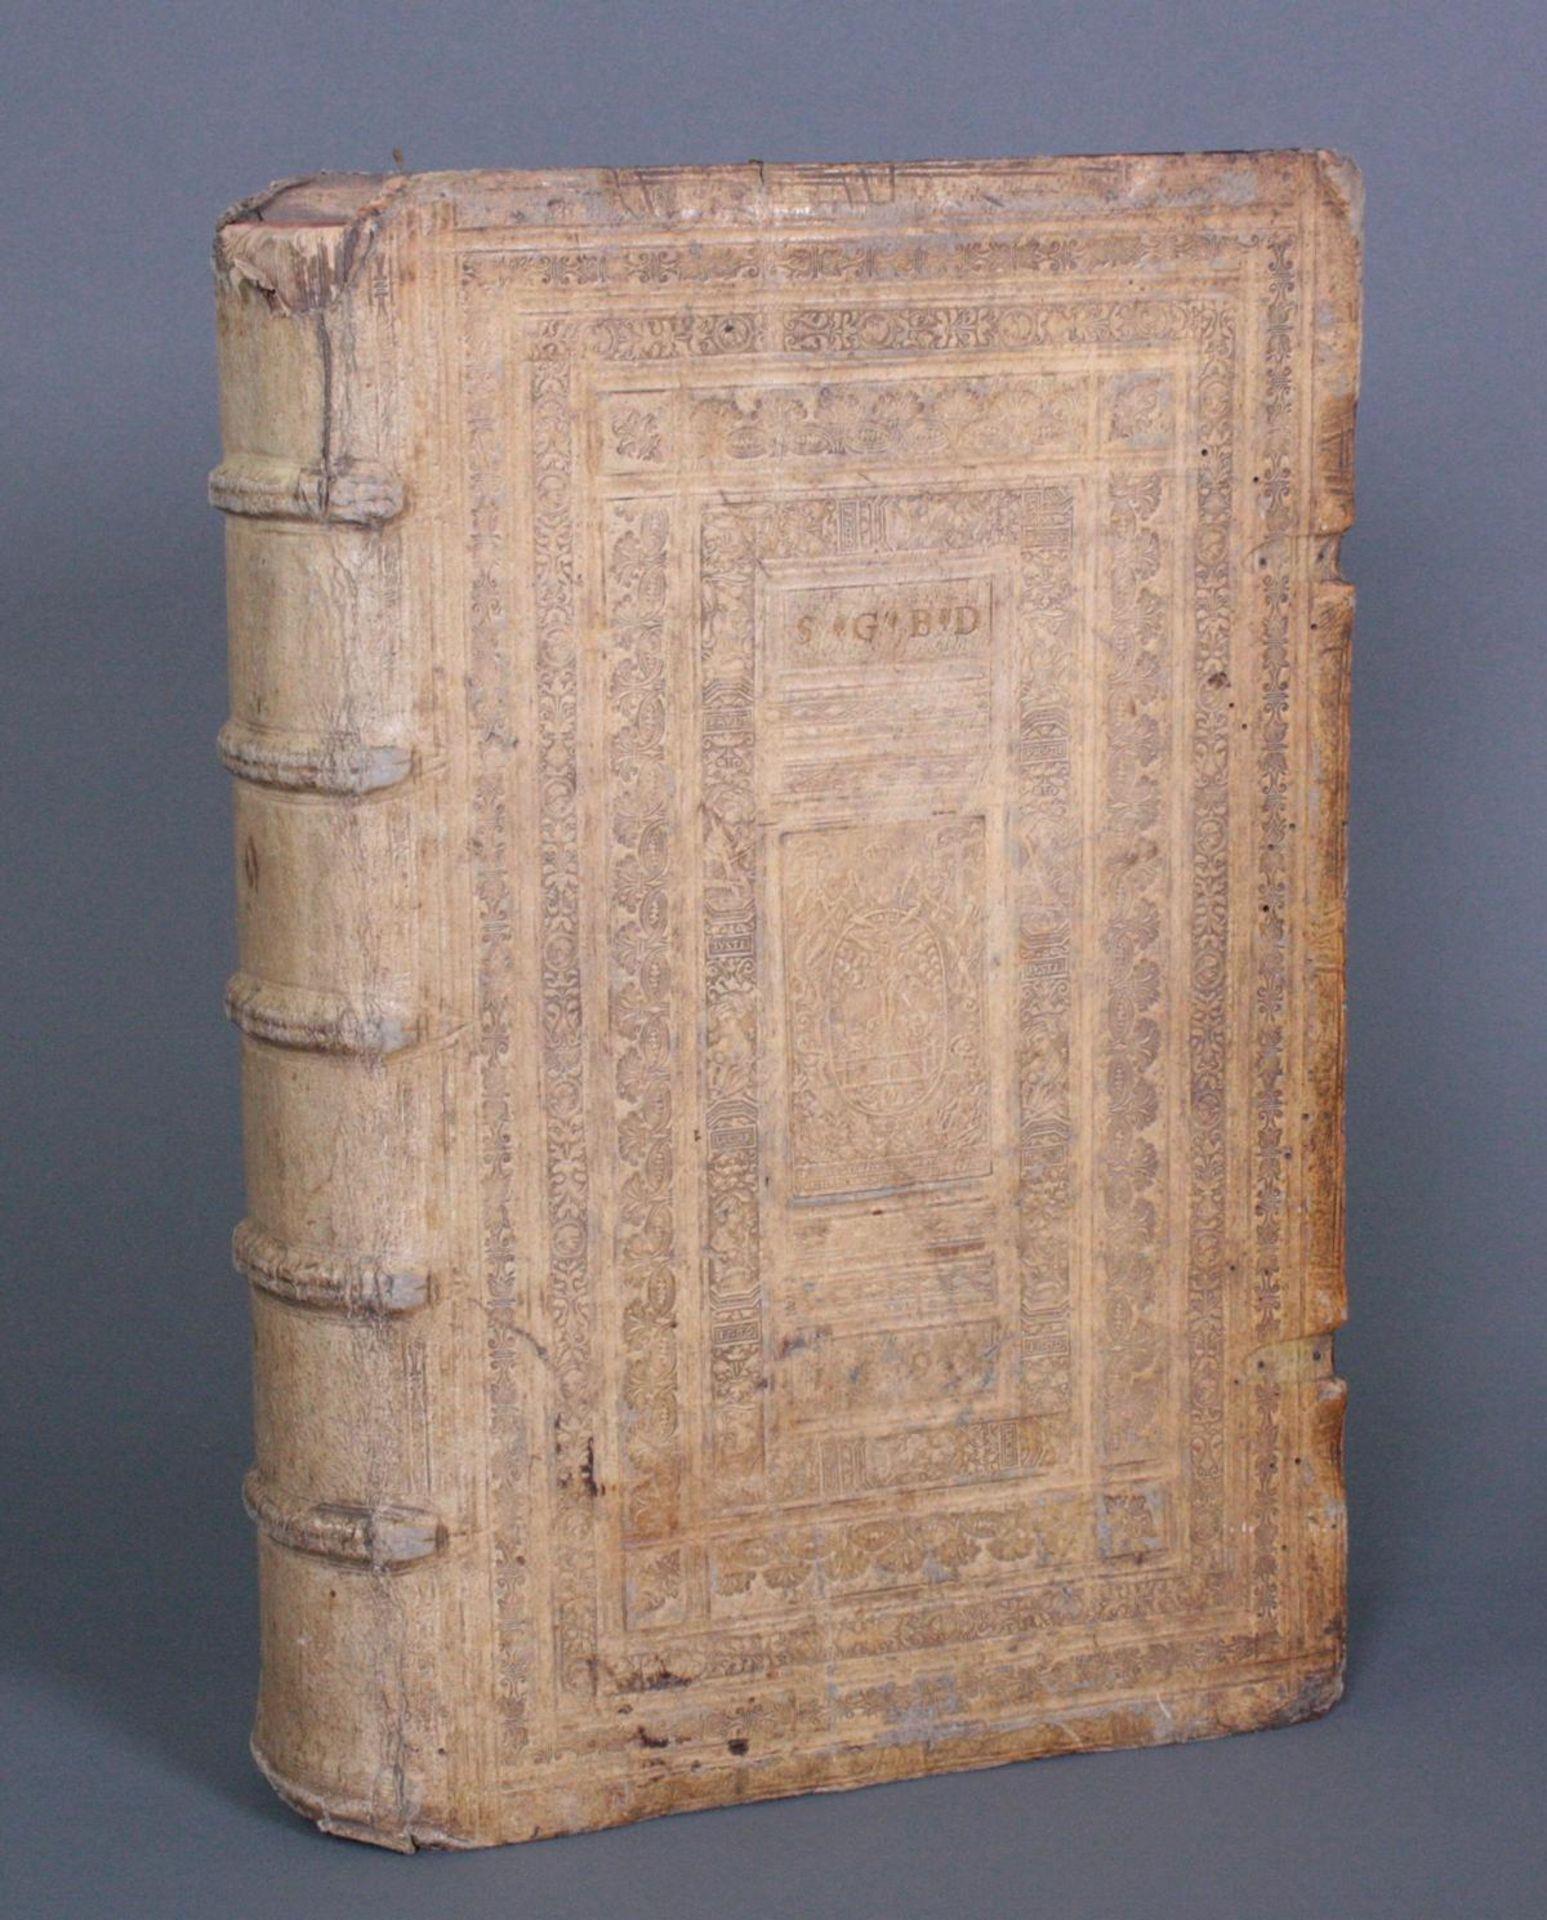 Griechische-Lateinische Bibel, Novum Testamentum 1582